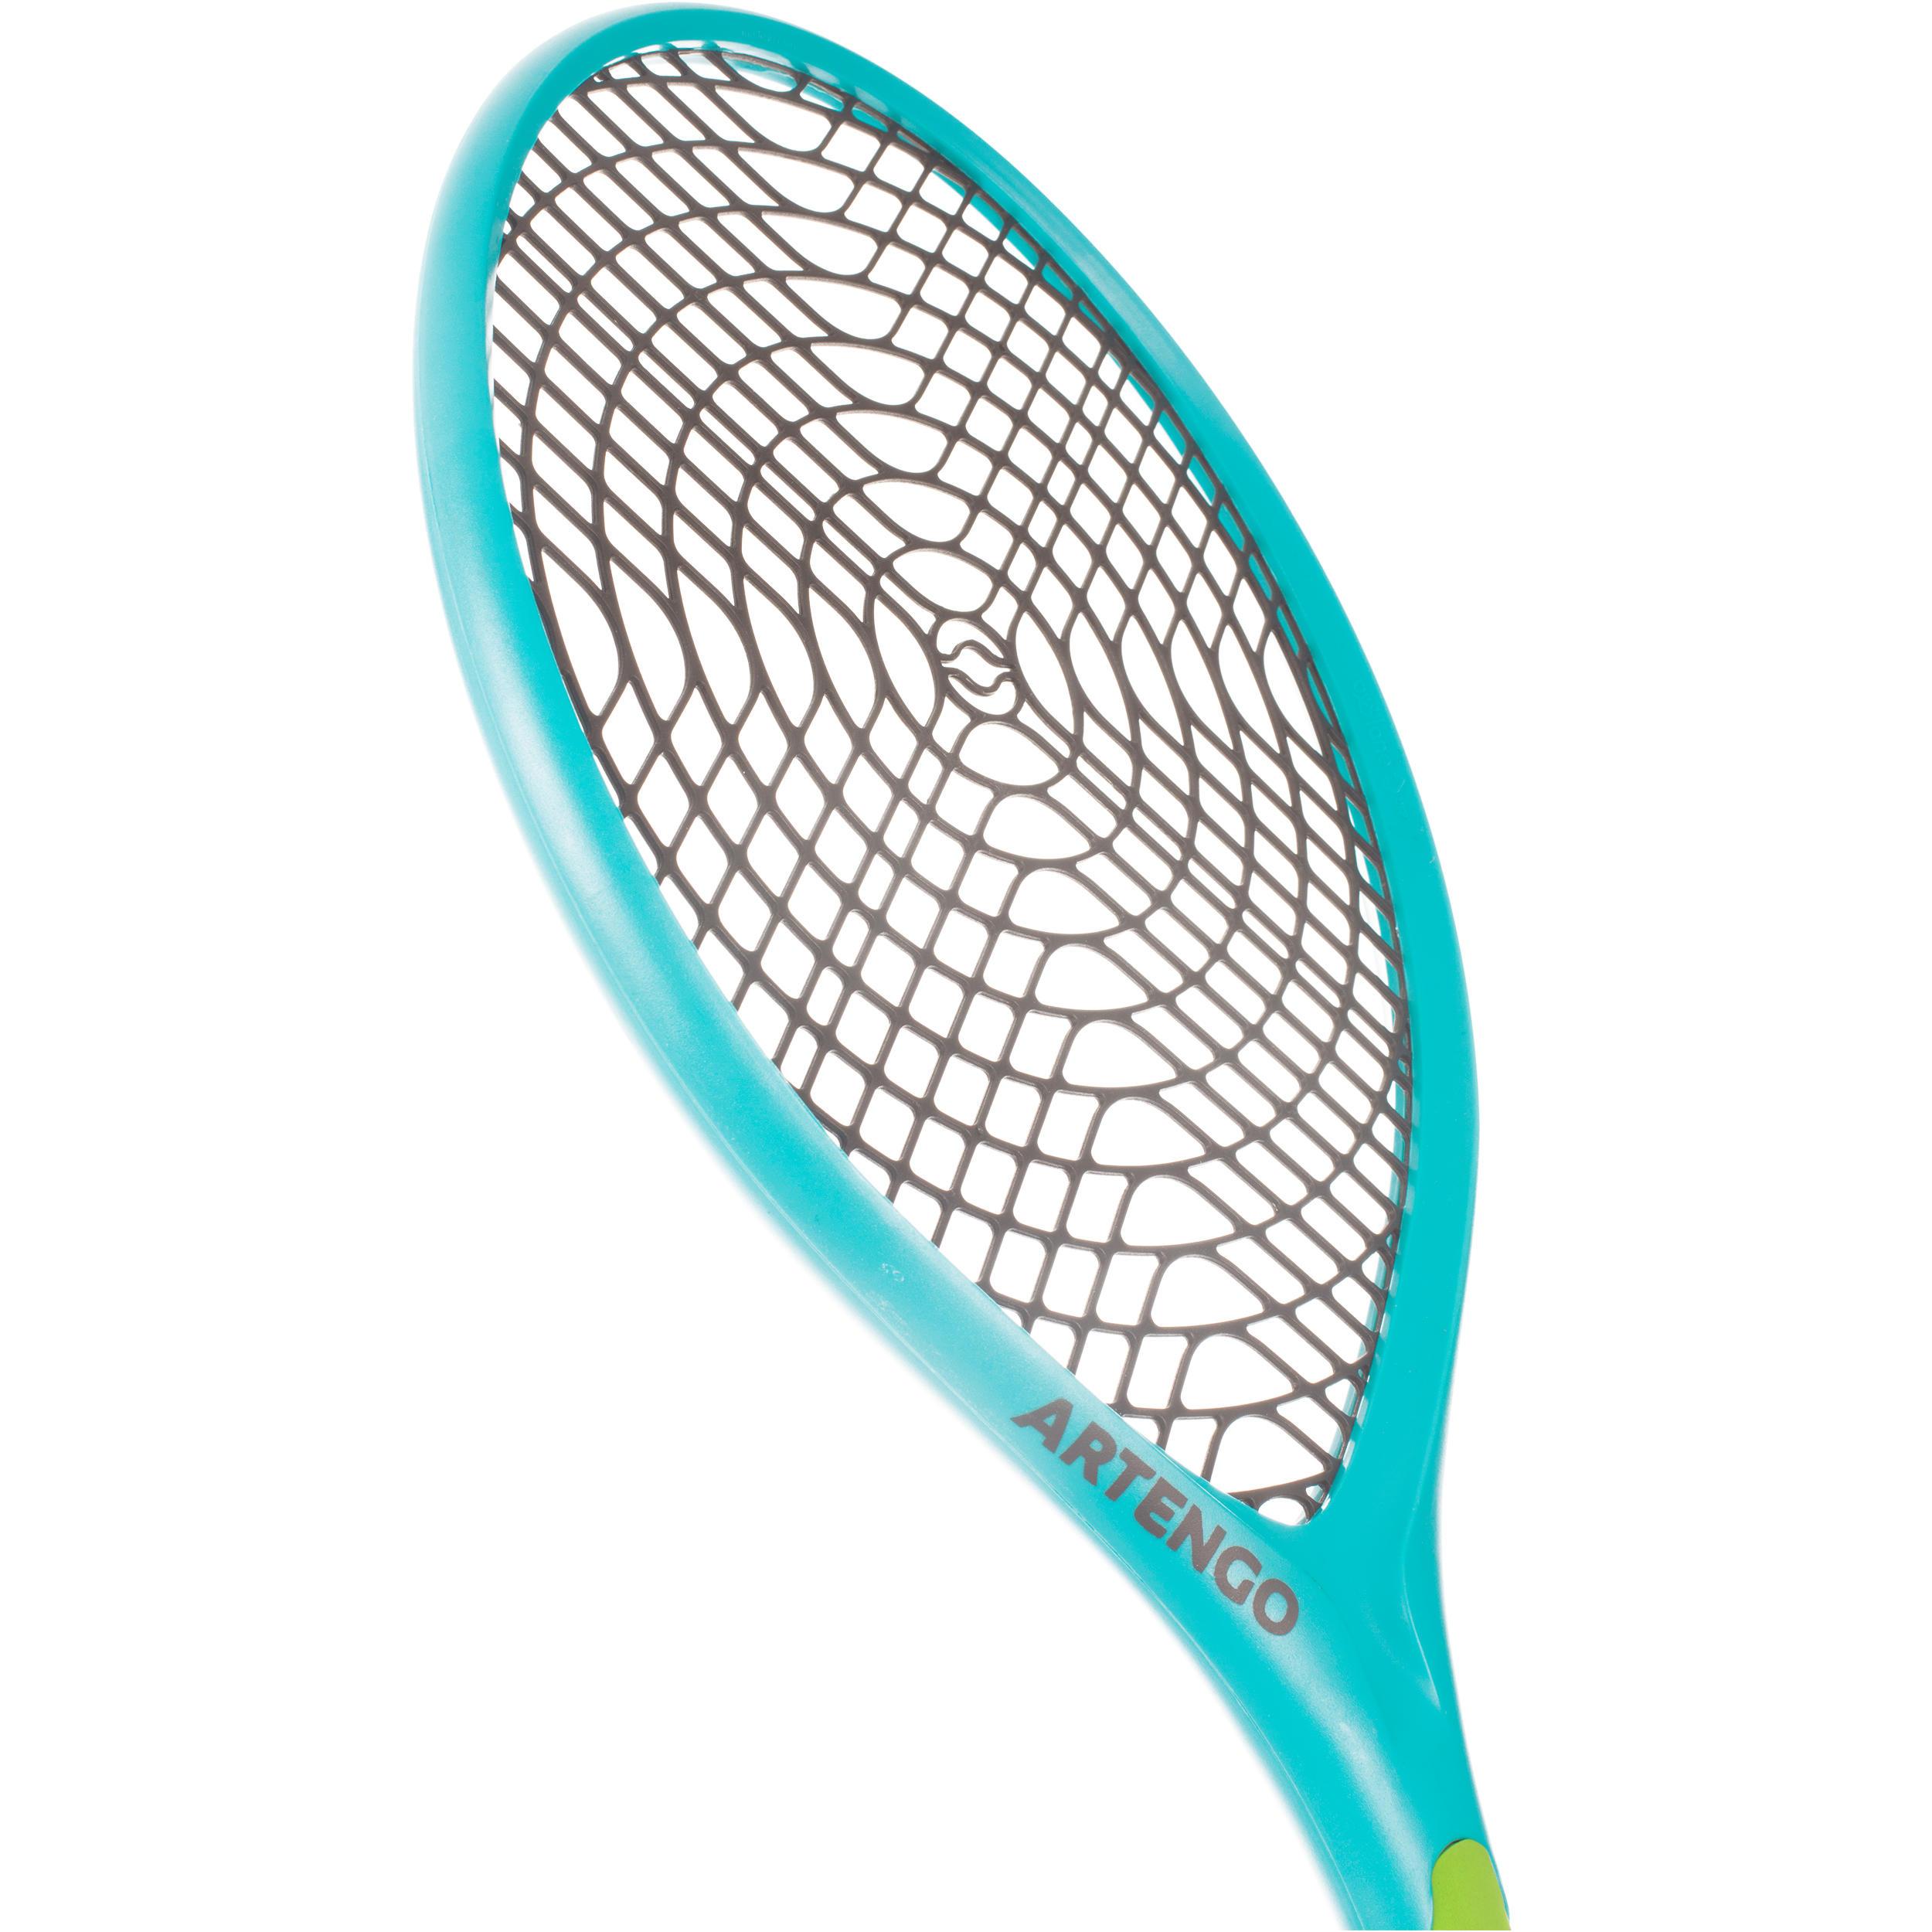 Funyten Plastic Tennis Set of 2 Racquets - Blue/Green